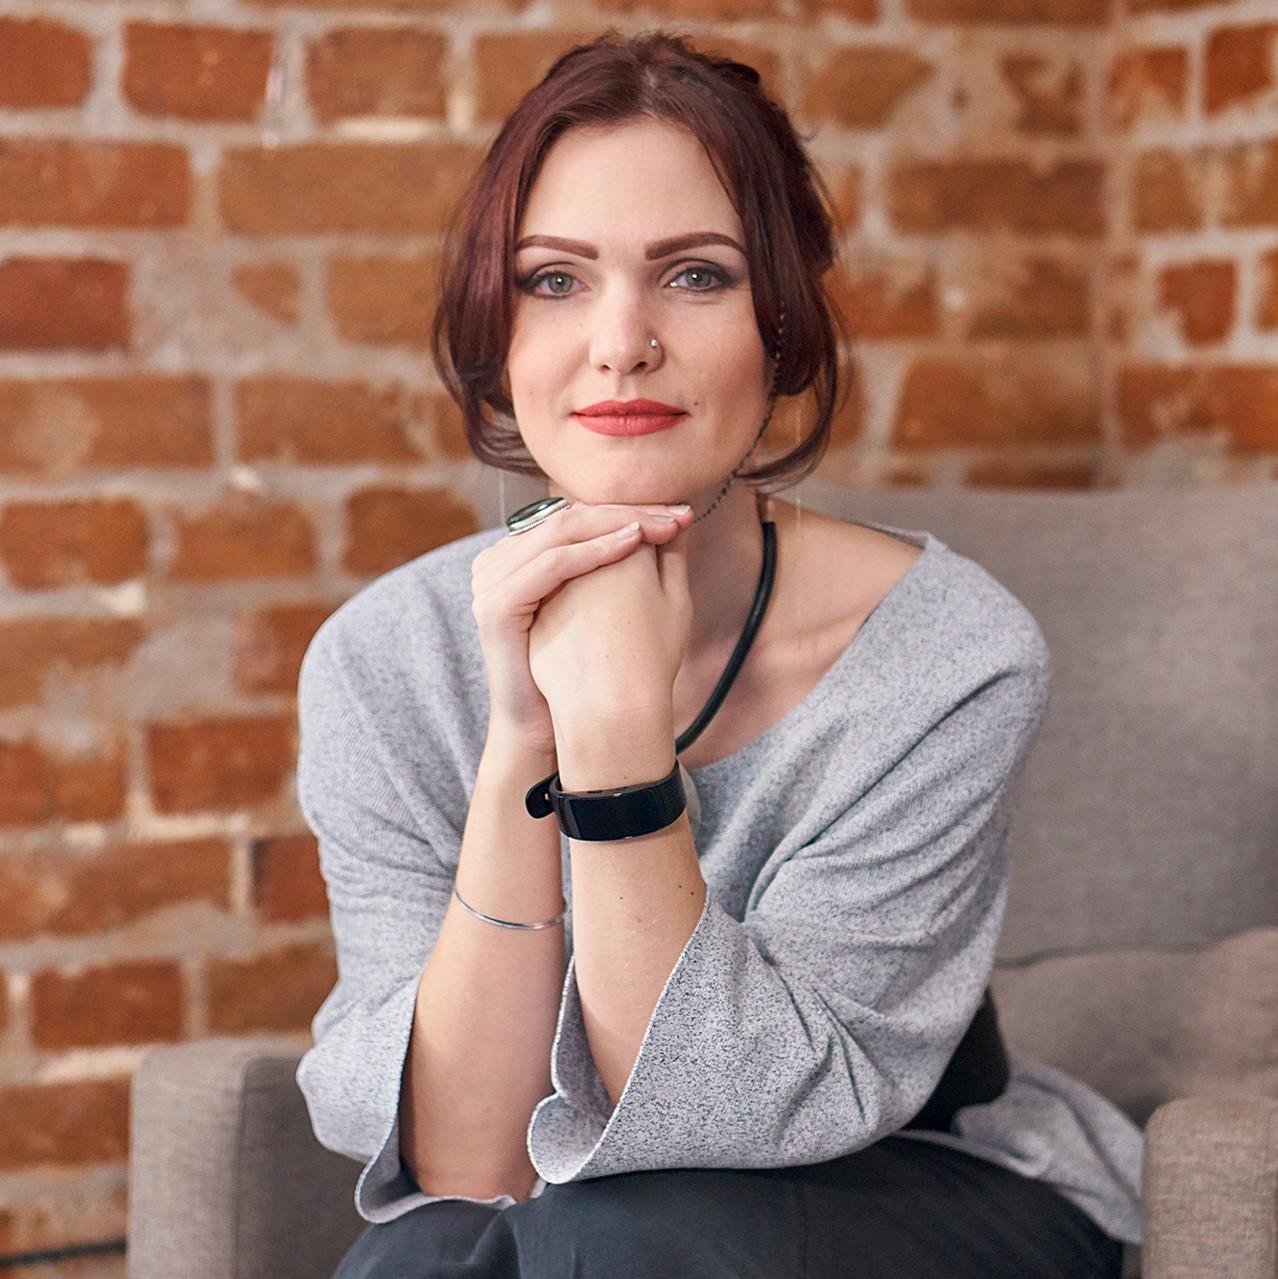 svetlana groiss, konzultacie online, tarot online, arteterapia online